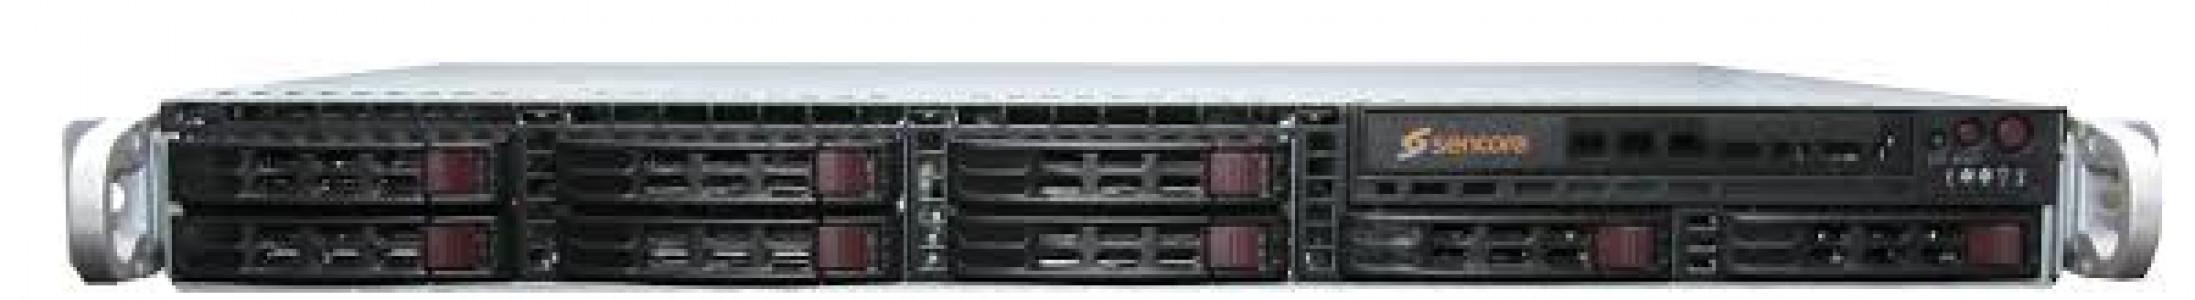 IP Streamer MIP 6210